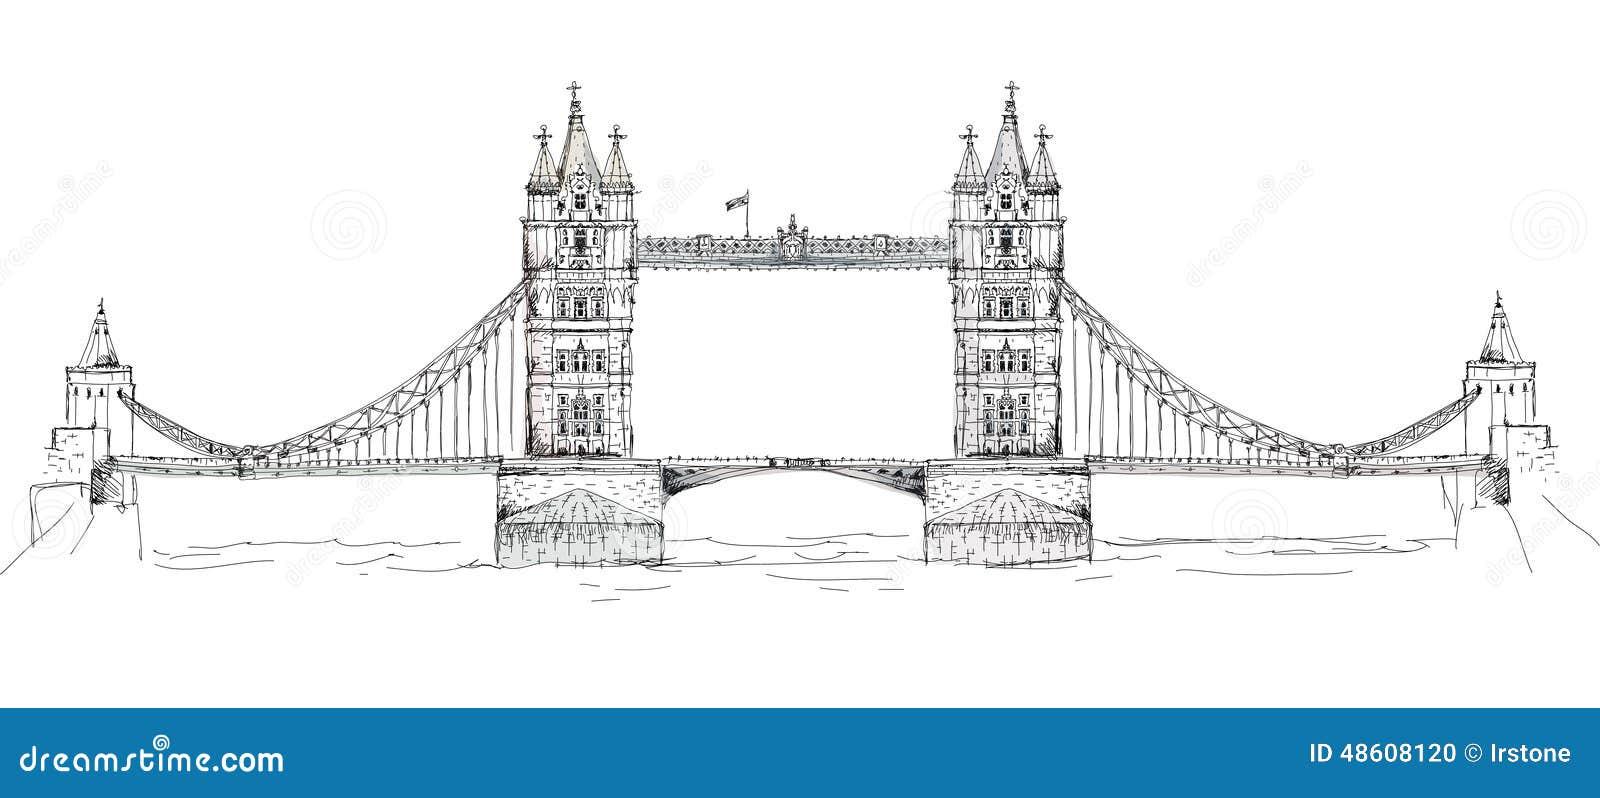 london tower bridge drawing sketch coloring page